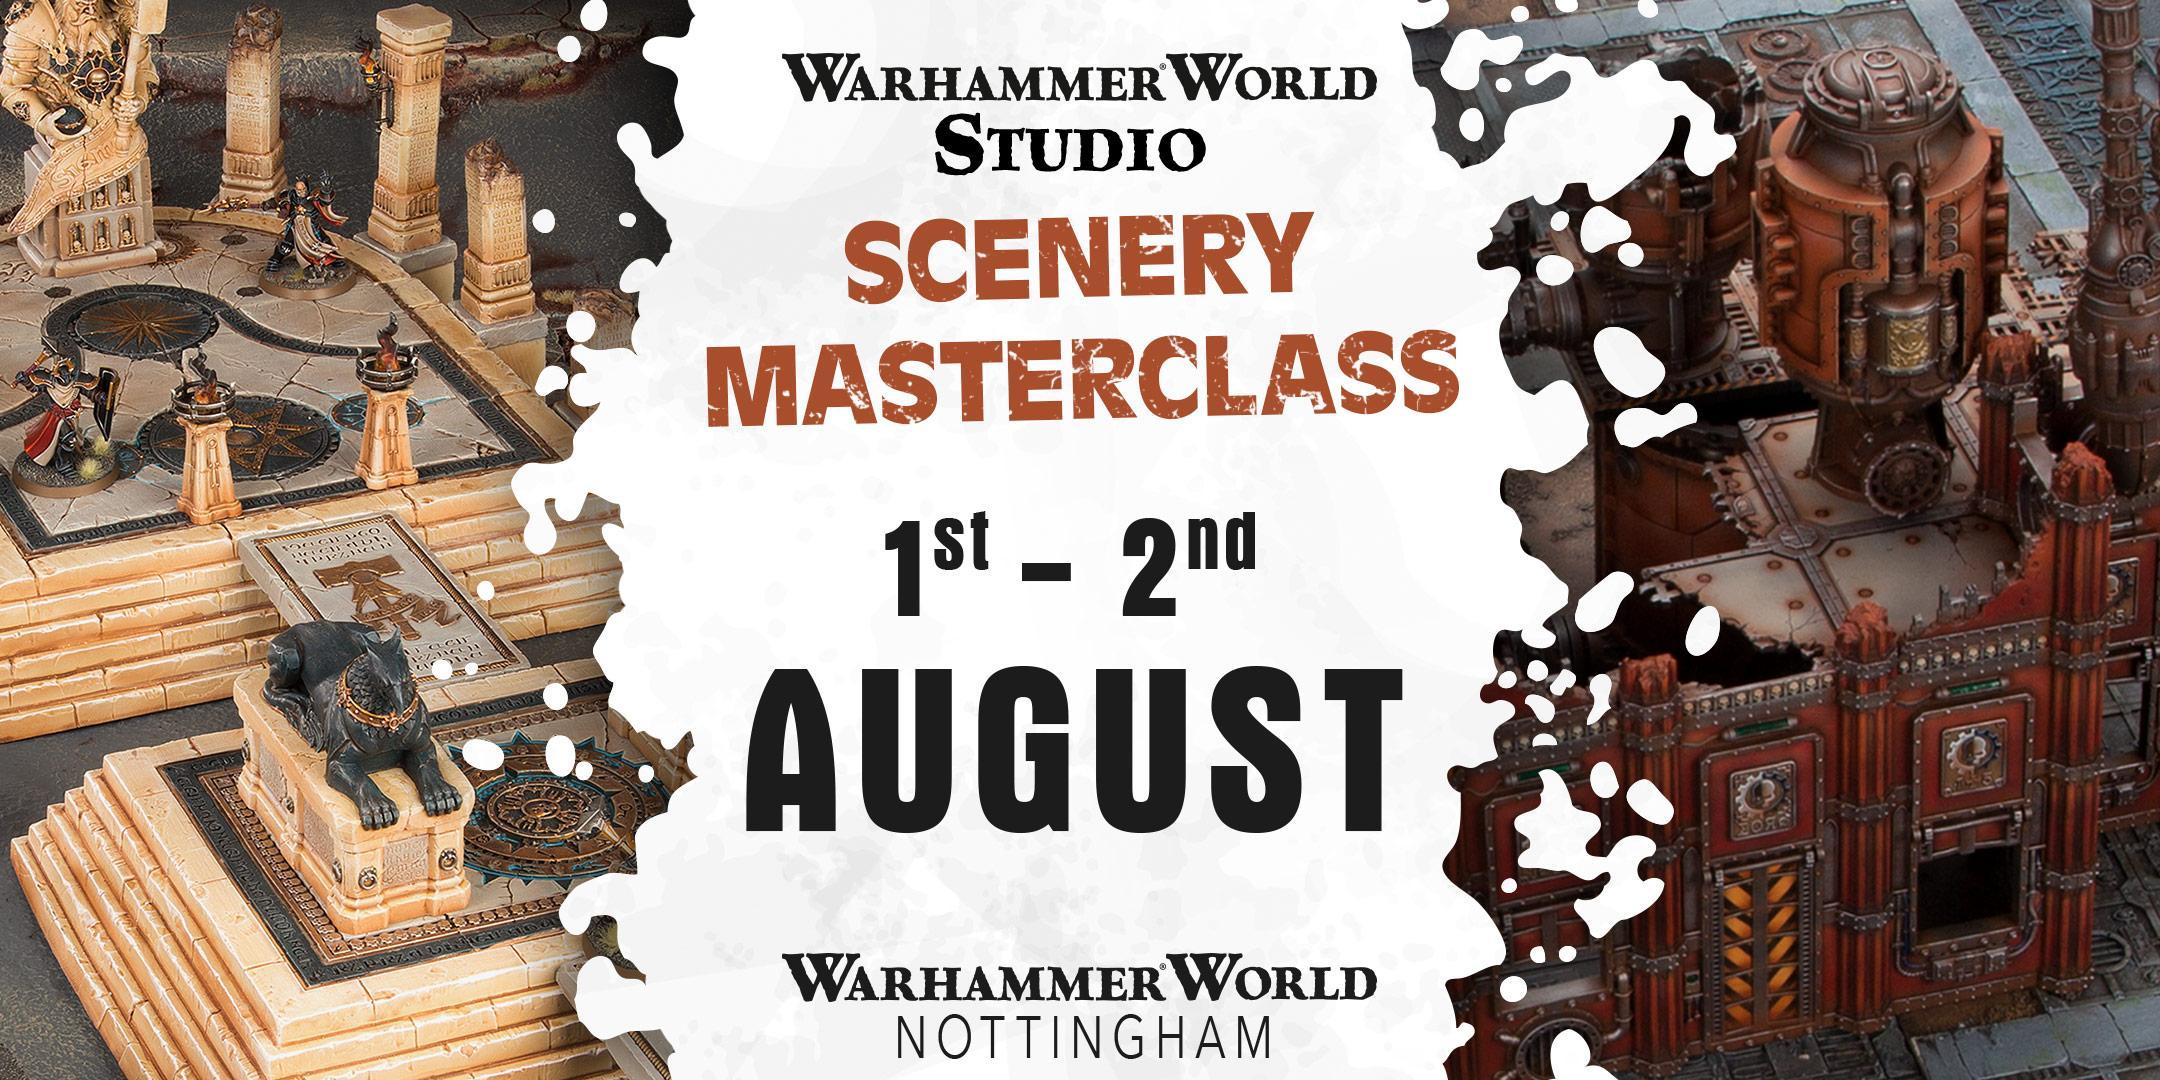 Warhammer World Studio Scenery Masterclass